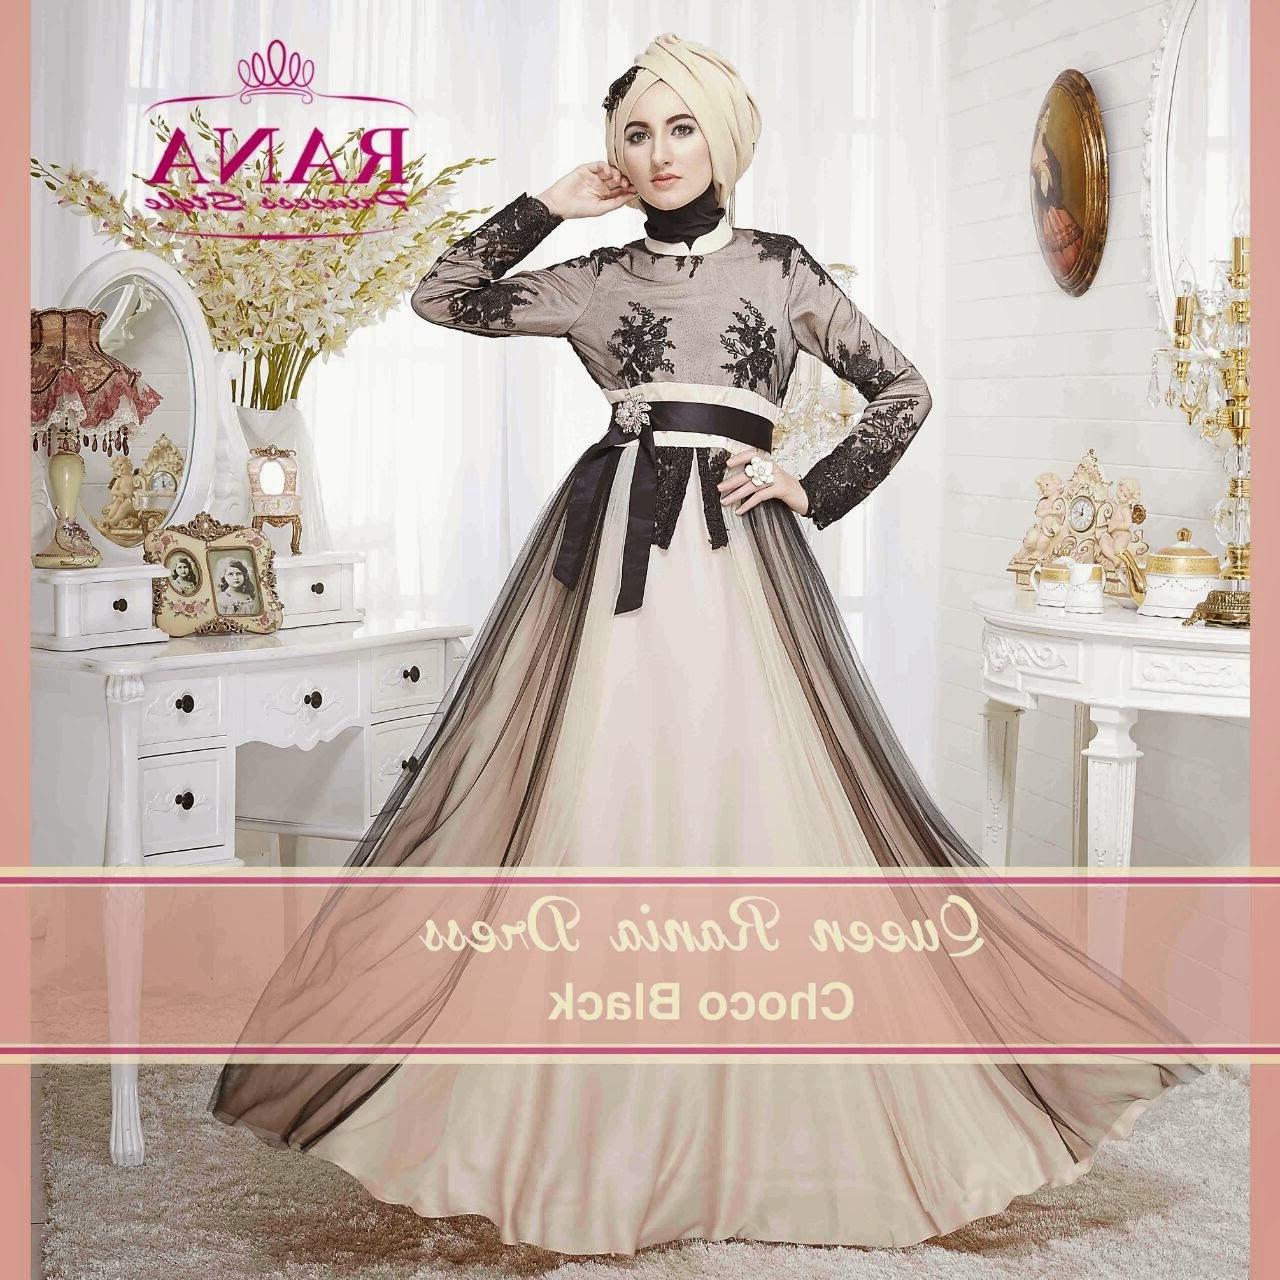 Ide Jual Baju Pengantin Muslimah Syar'i S1du Model Kebaya Pengantin Muslimah 2014